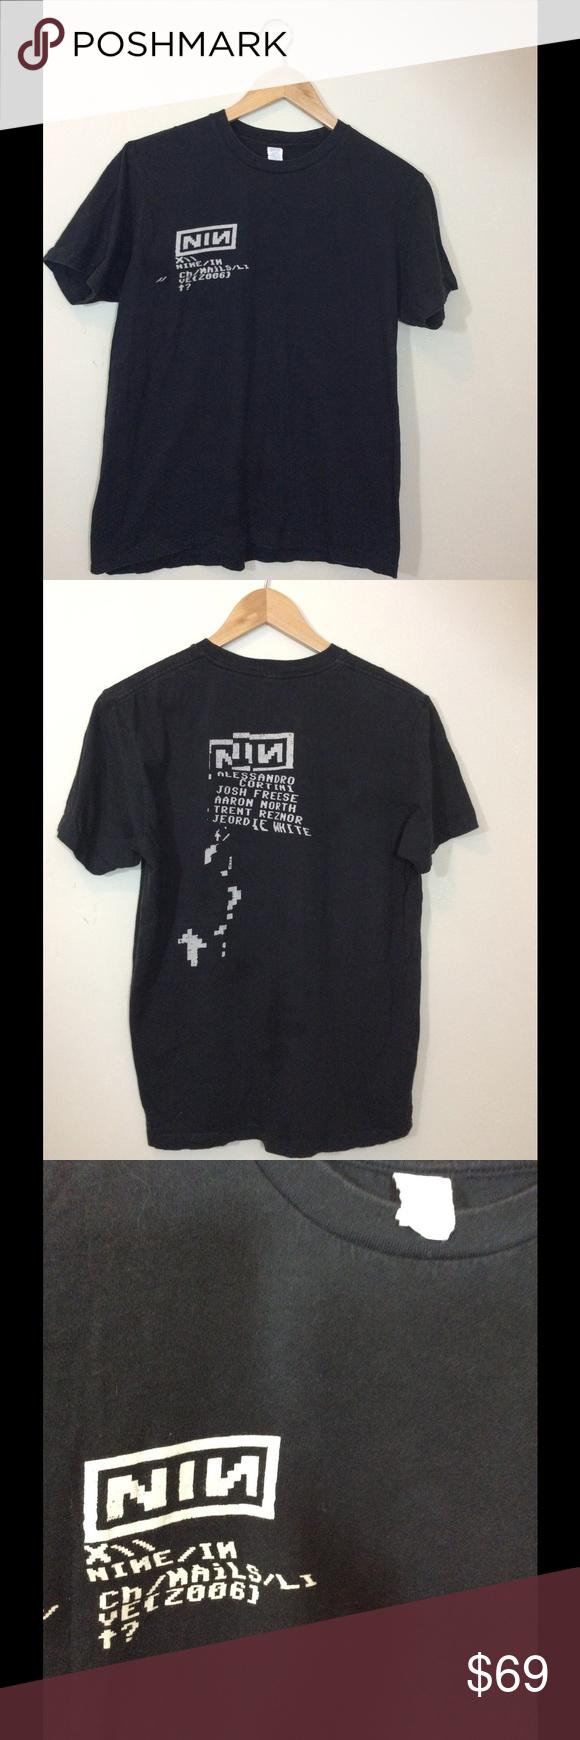 Black Nine Inch Nails NIN Band Vintage T-shirt | Short sleeves ...